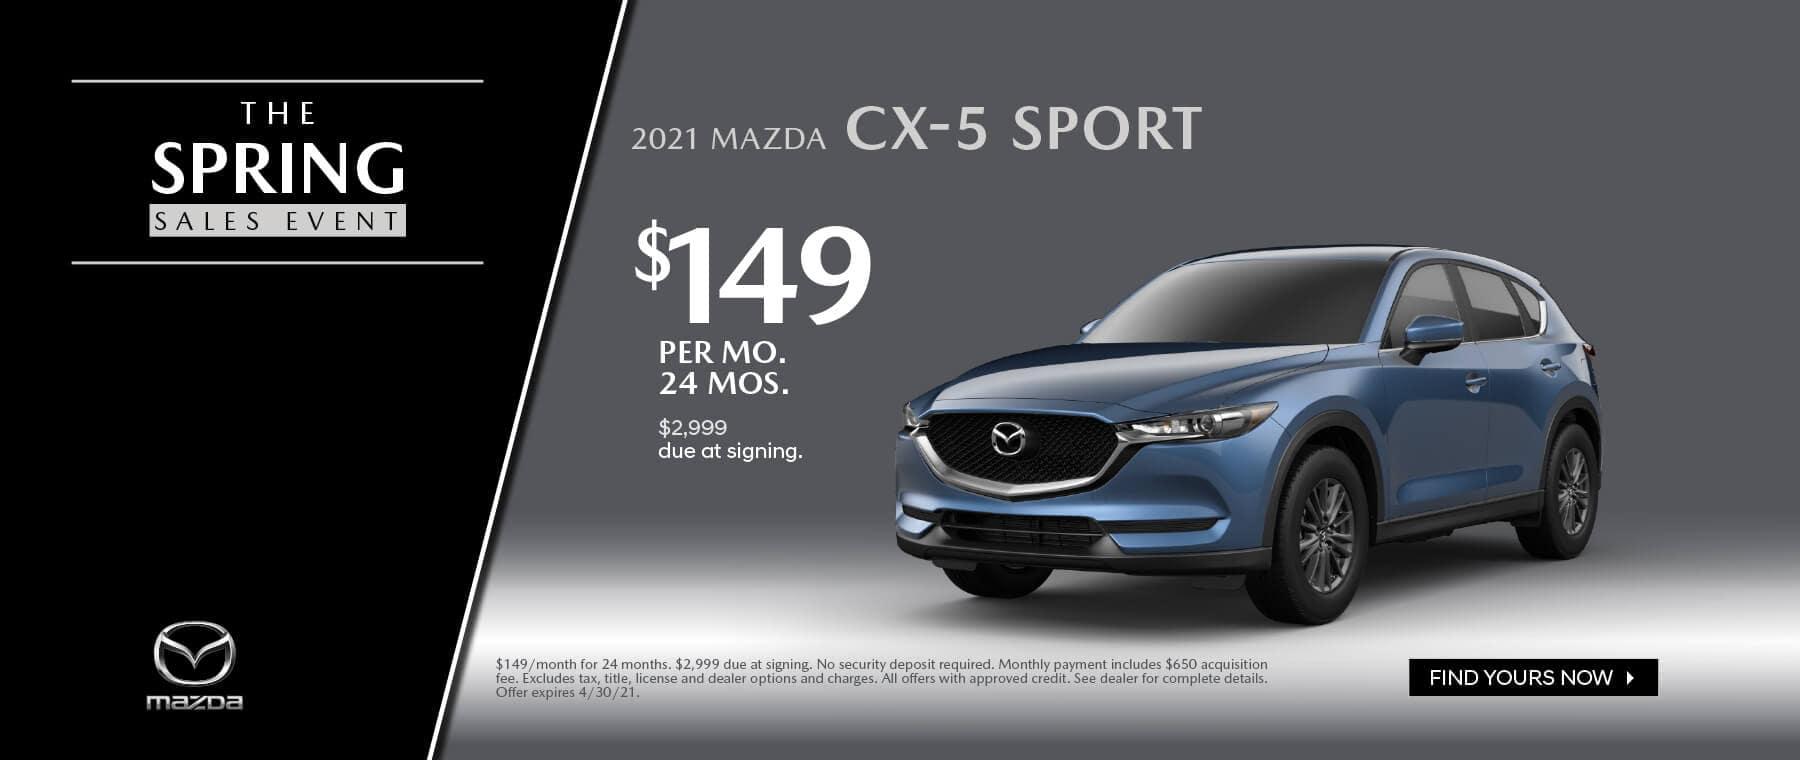 2021.04.15-Keffer-Mazda-APR-Web-Banner-Offer-Update-S51838vw-3